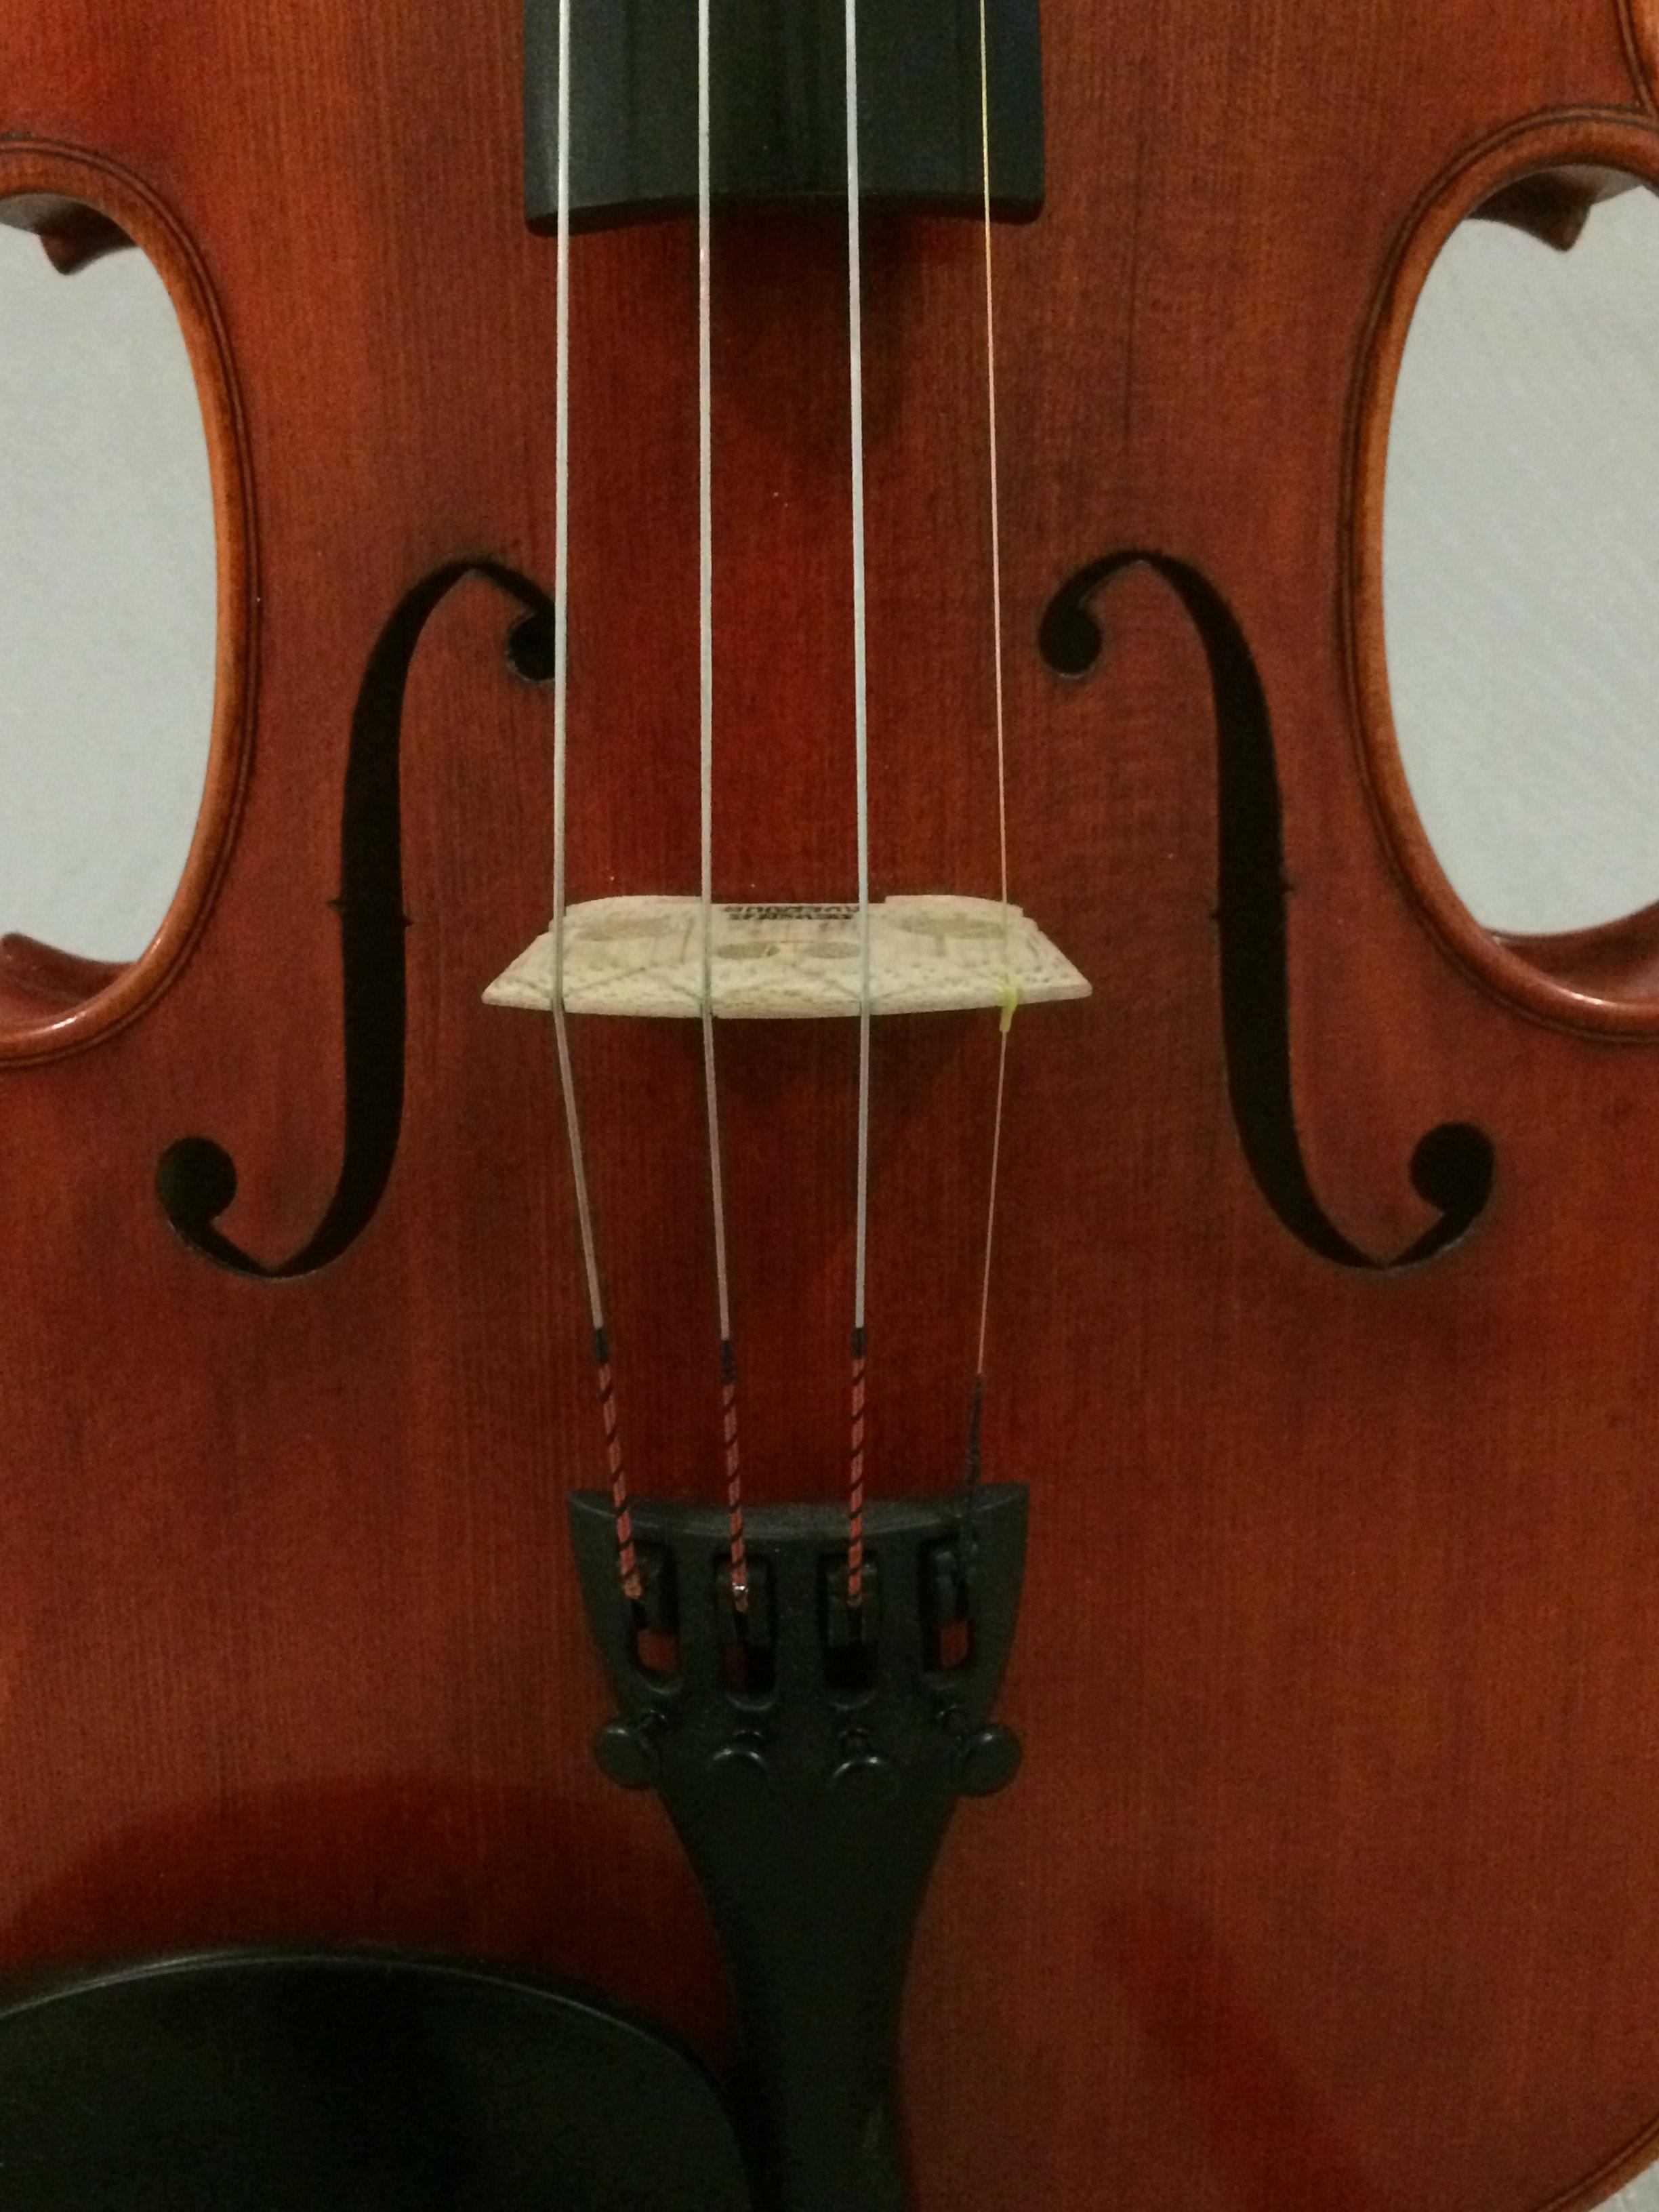 handmade violin 4 4 strad style by graeme harrison adelaide harrison music. Black Bedroom Furniture Sets. Home Design Ideas